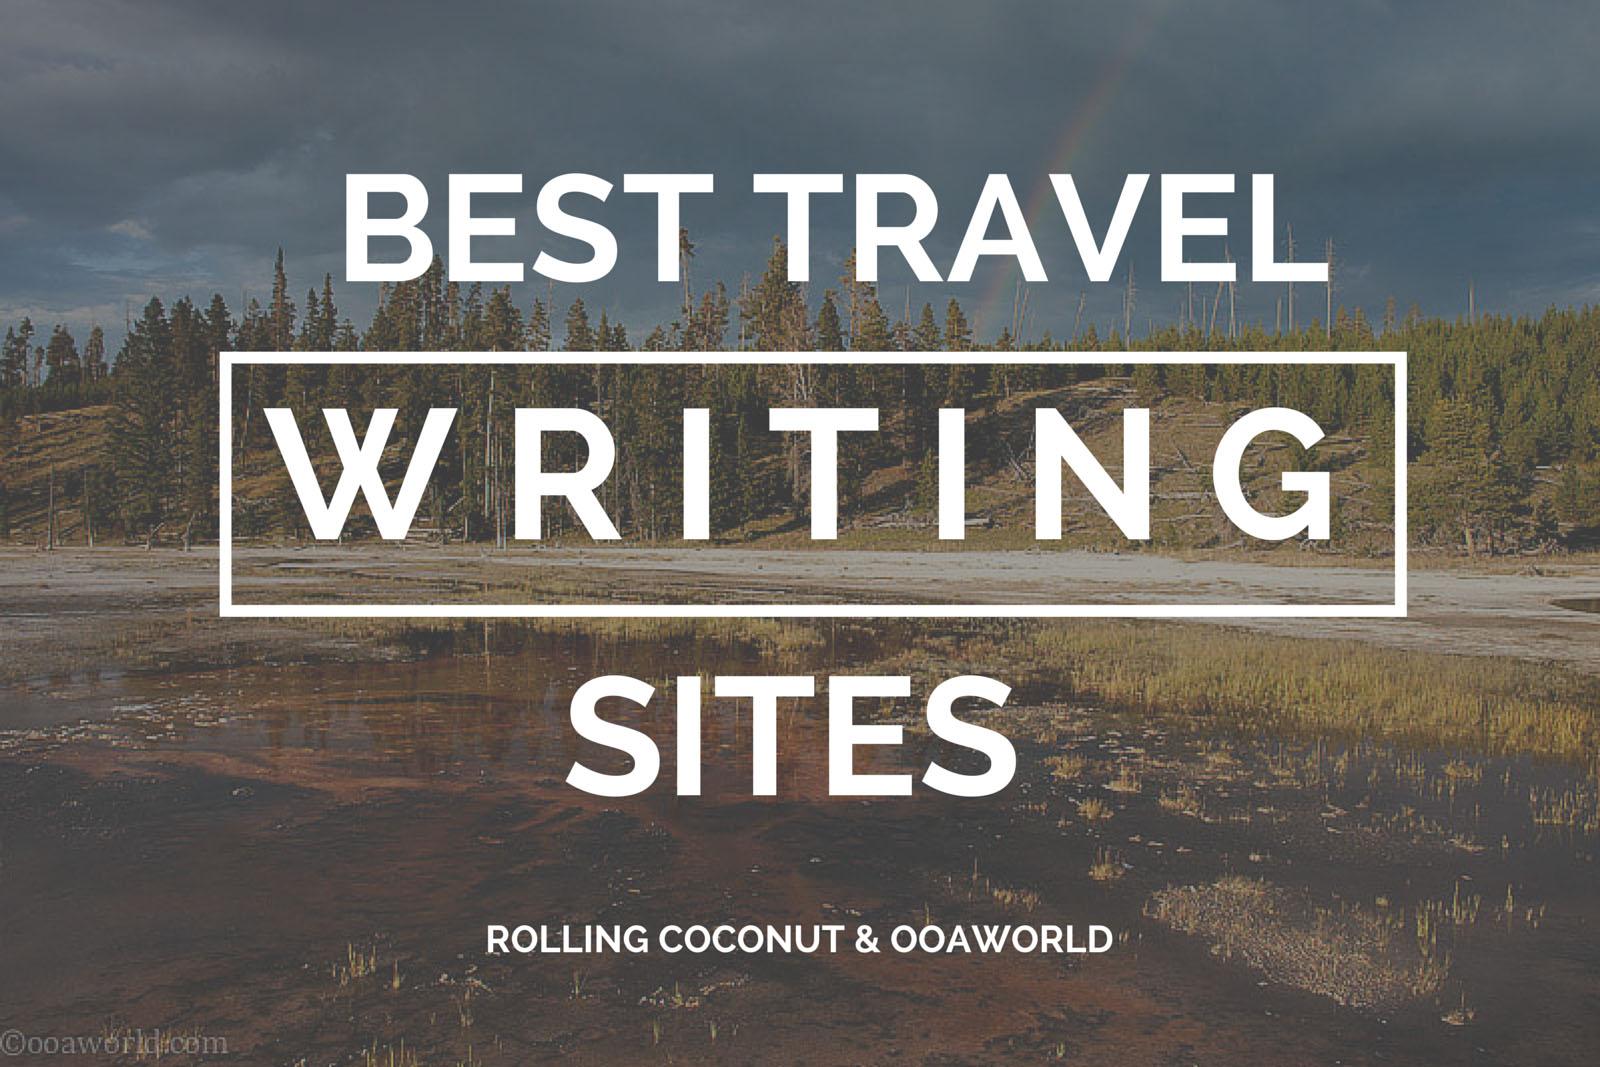 Best Travel Writing Sites Ooaworld Photo Ooaworld